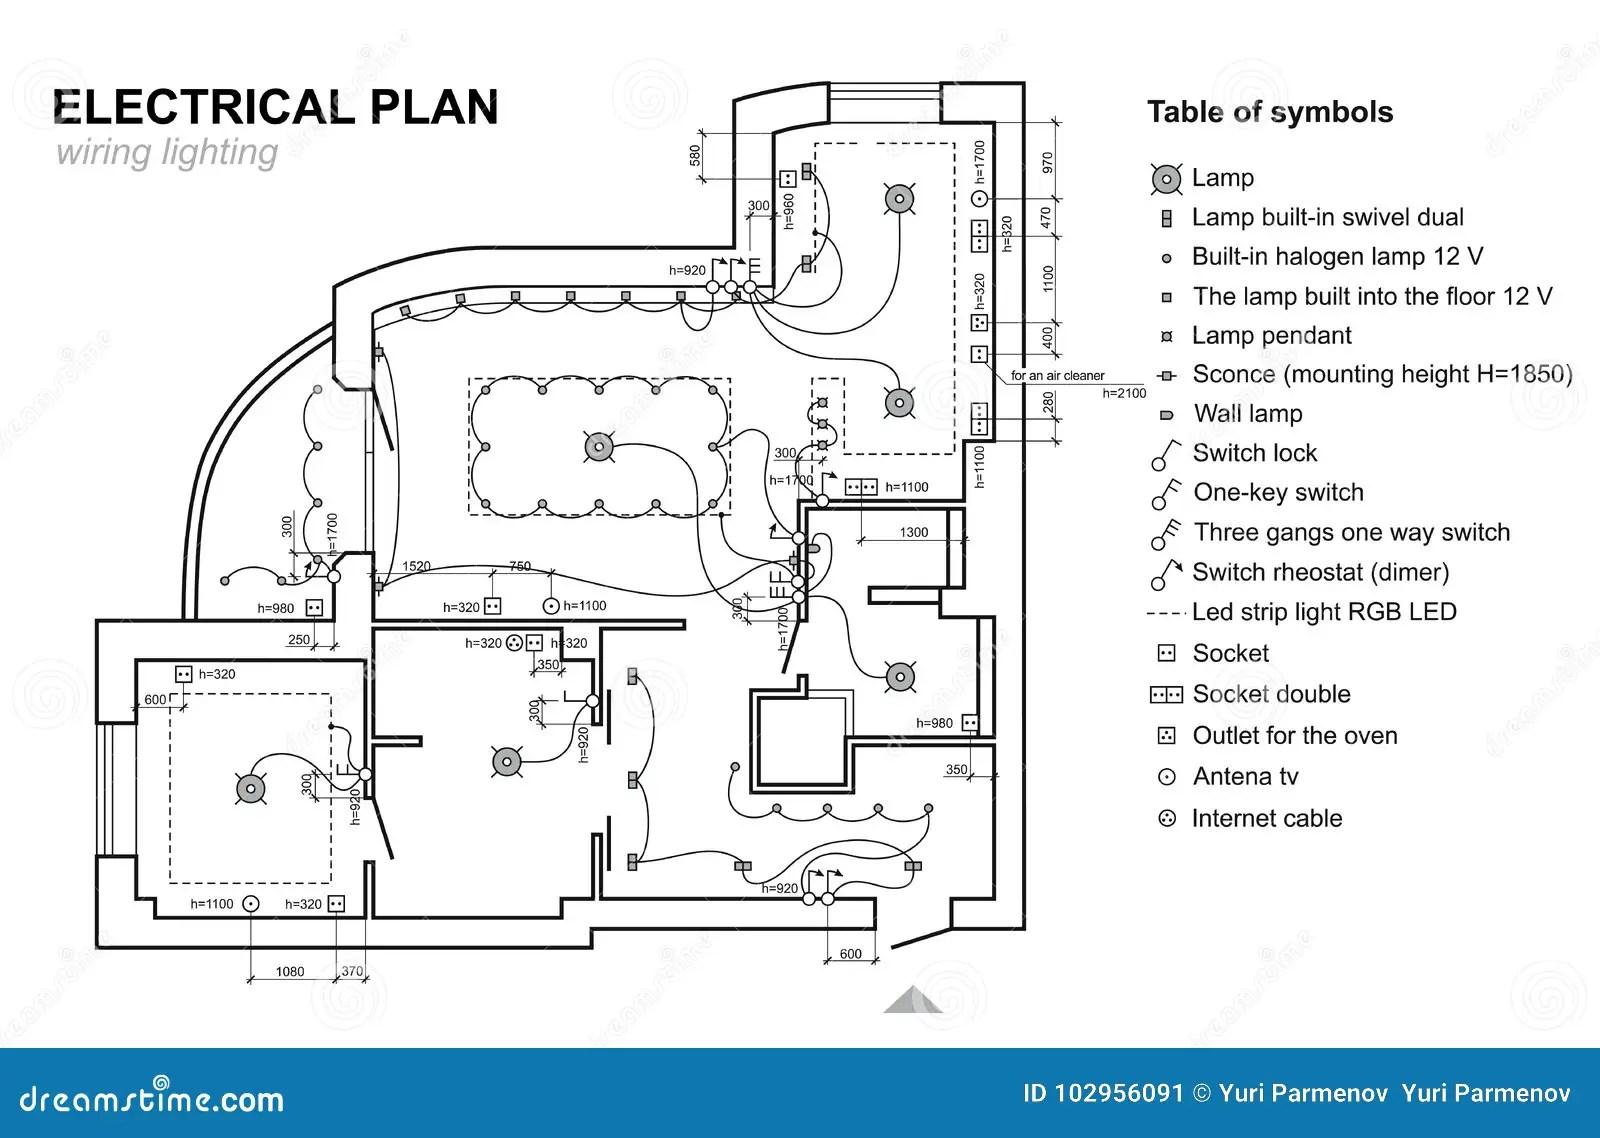 building electrical wiring diagram symbols mustang harness plan lighting schematic interior set